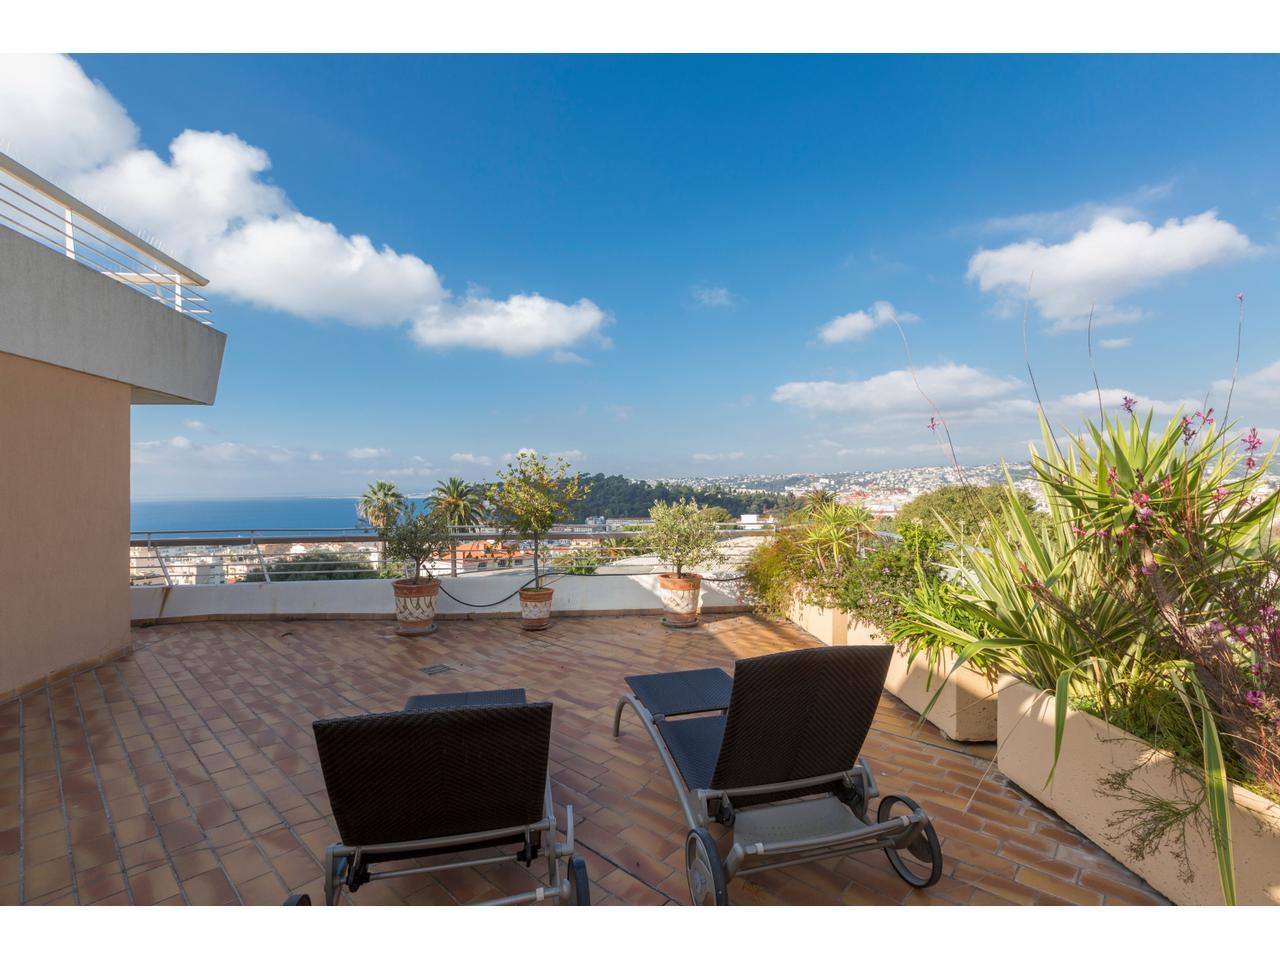 Immobilier nice vue mer appartement nice mont boron - Appartement a vendre port vendres vue mer ...